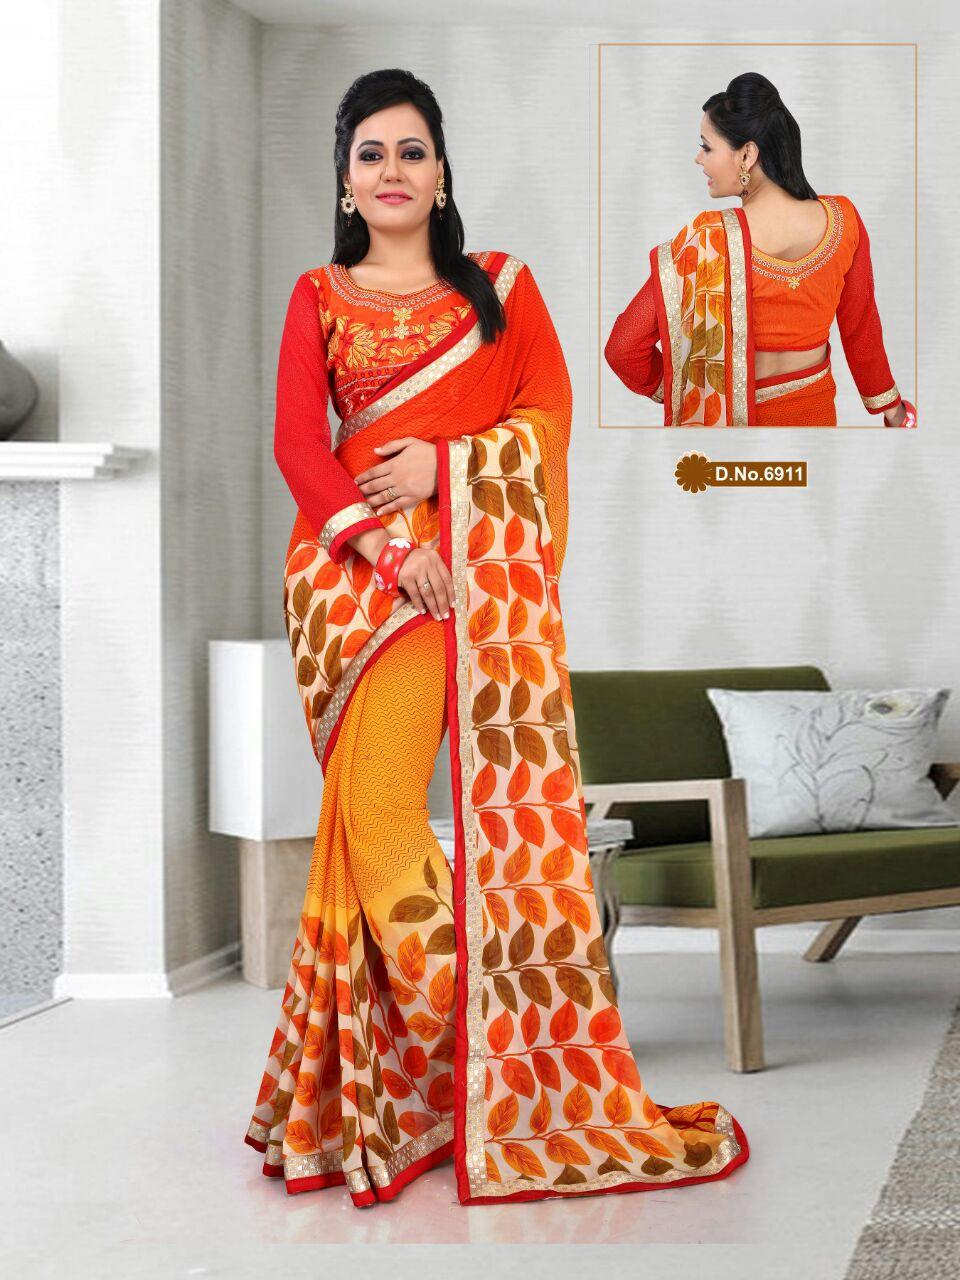 Celebration-3- Stylish  Designer Latest Collection of Sarees